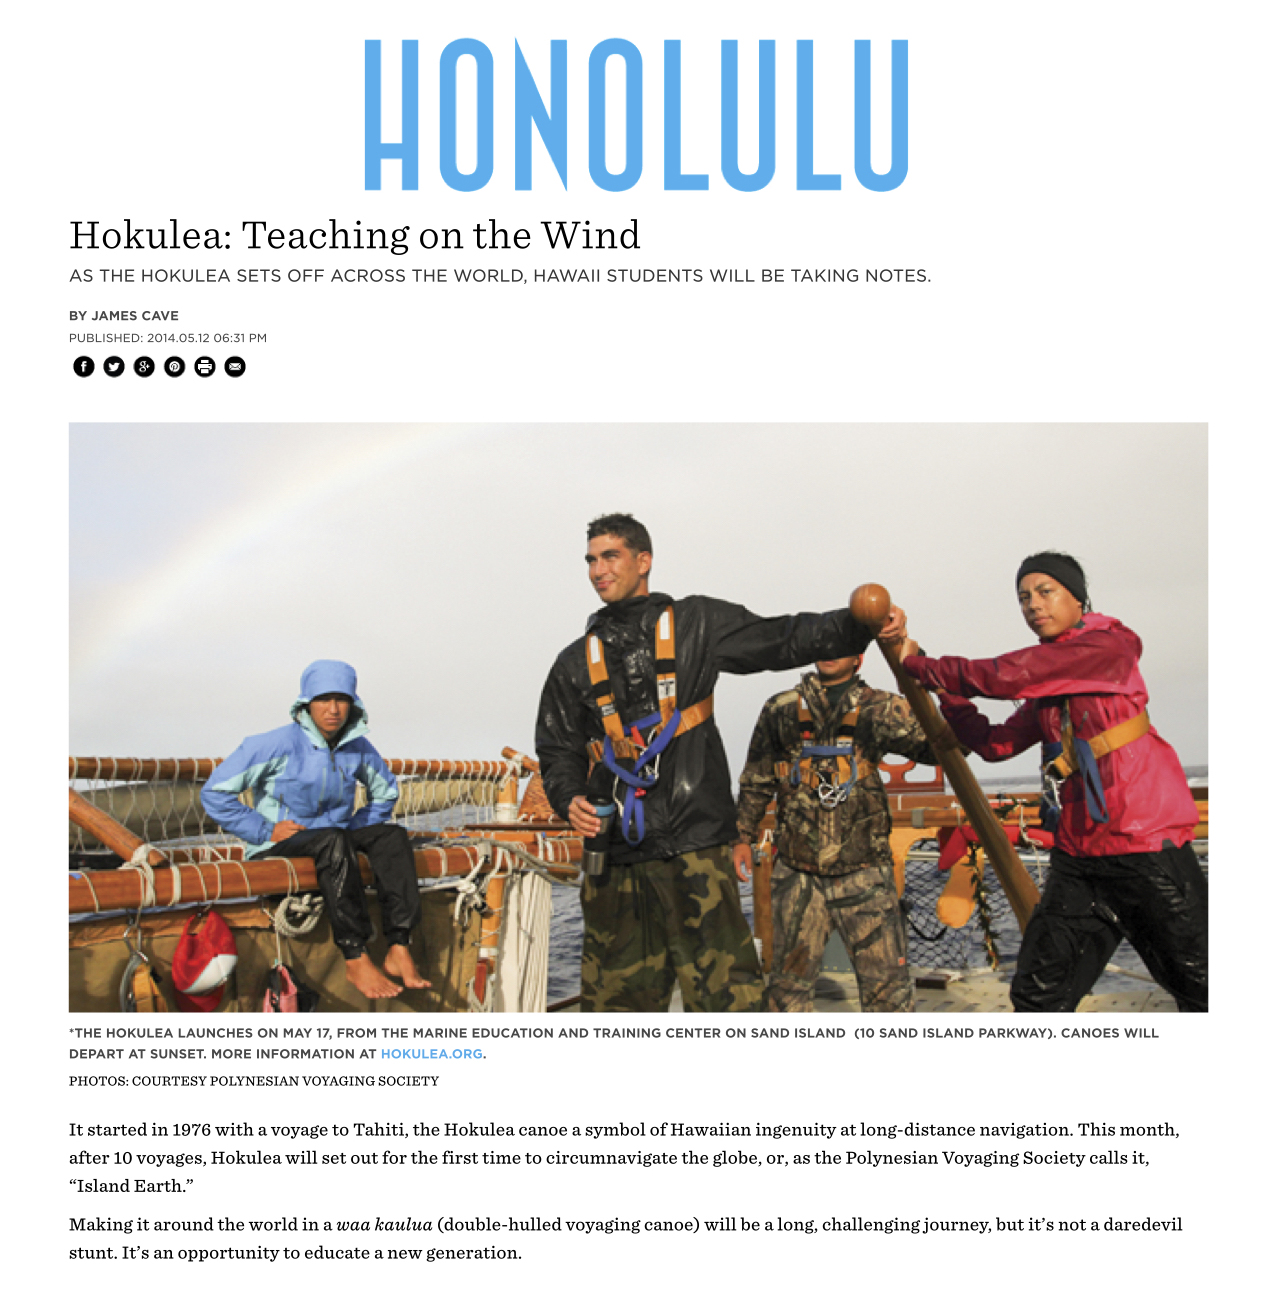 Hokulea- Teaching on the Wind - Honolulu Magazine - May 2014 - Hawaii copy.jpg